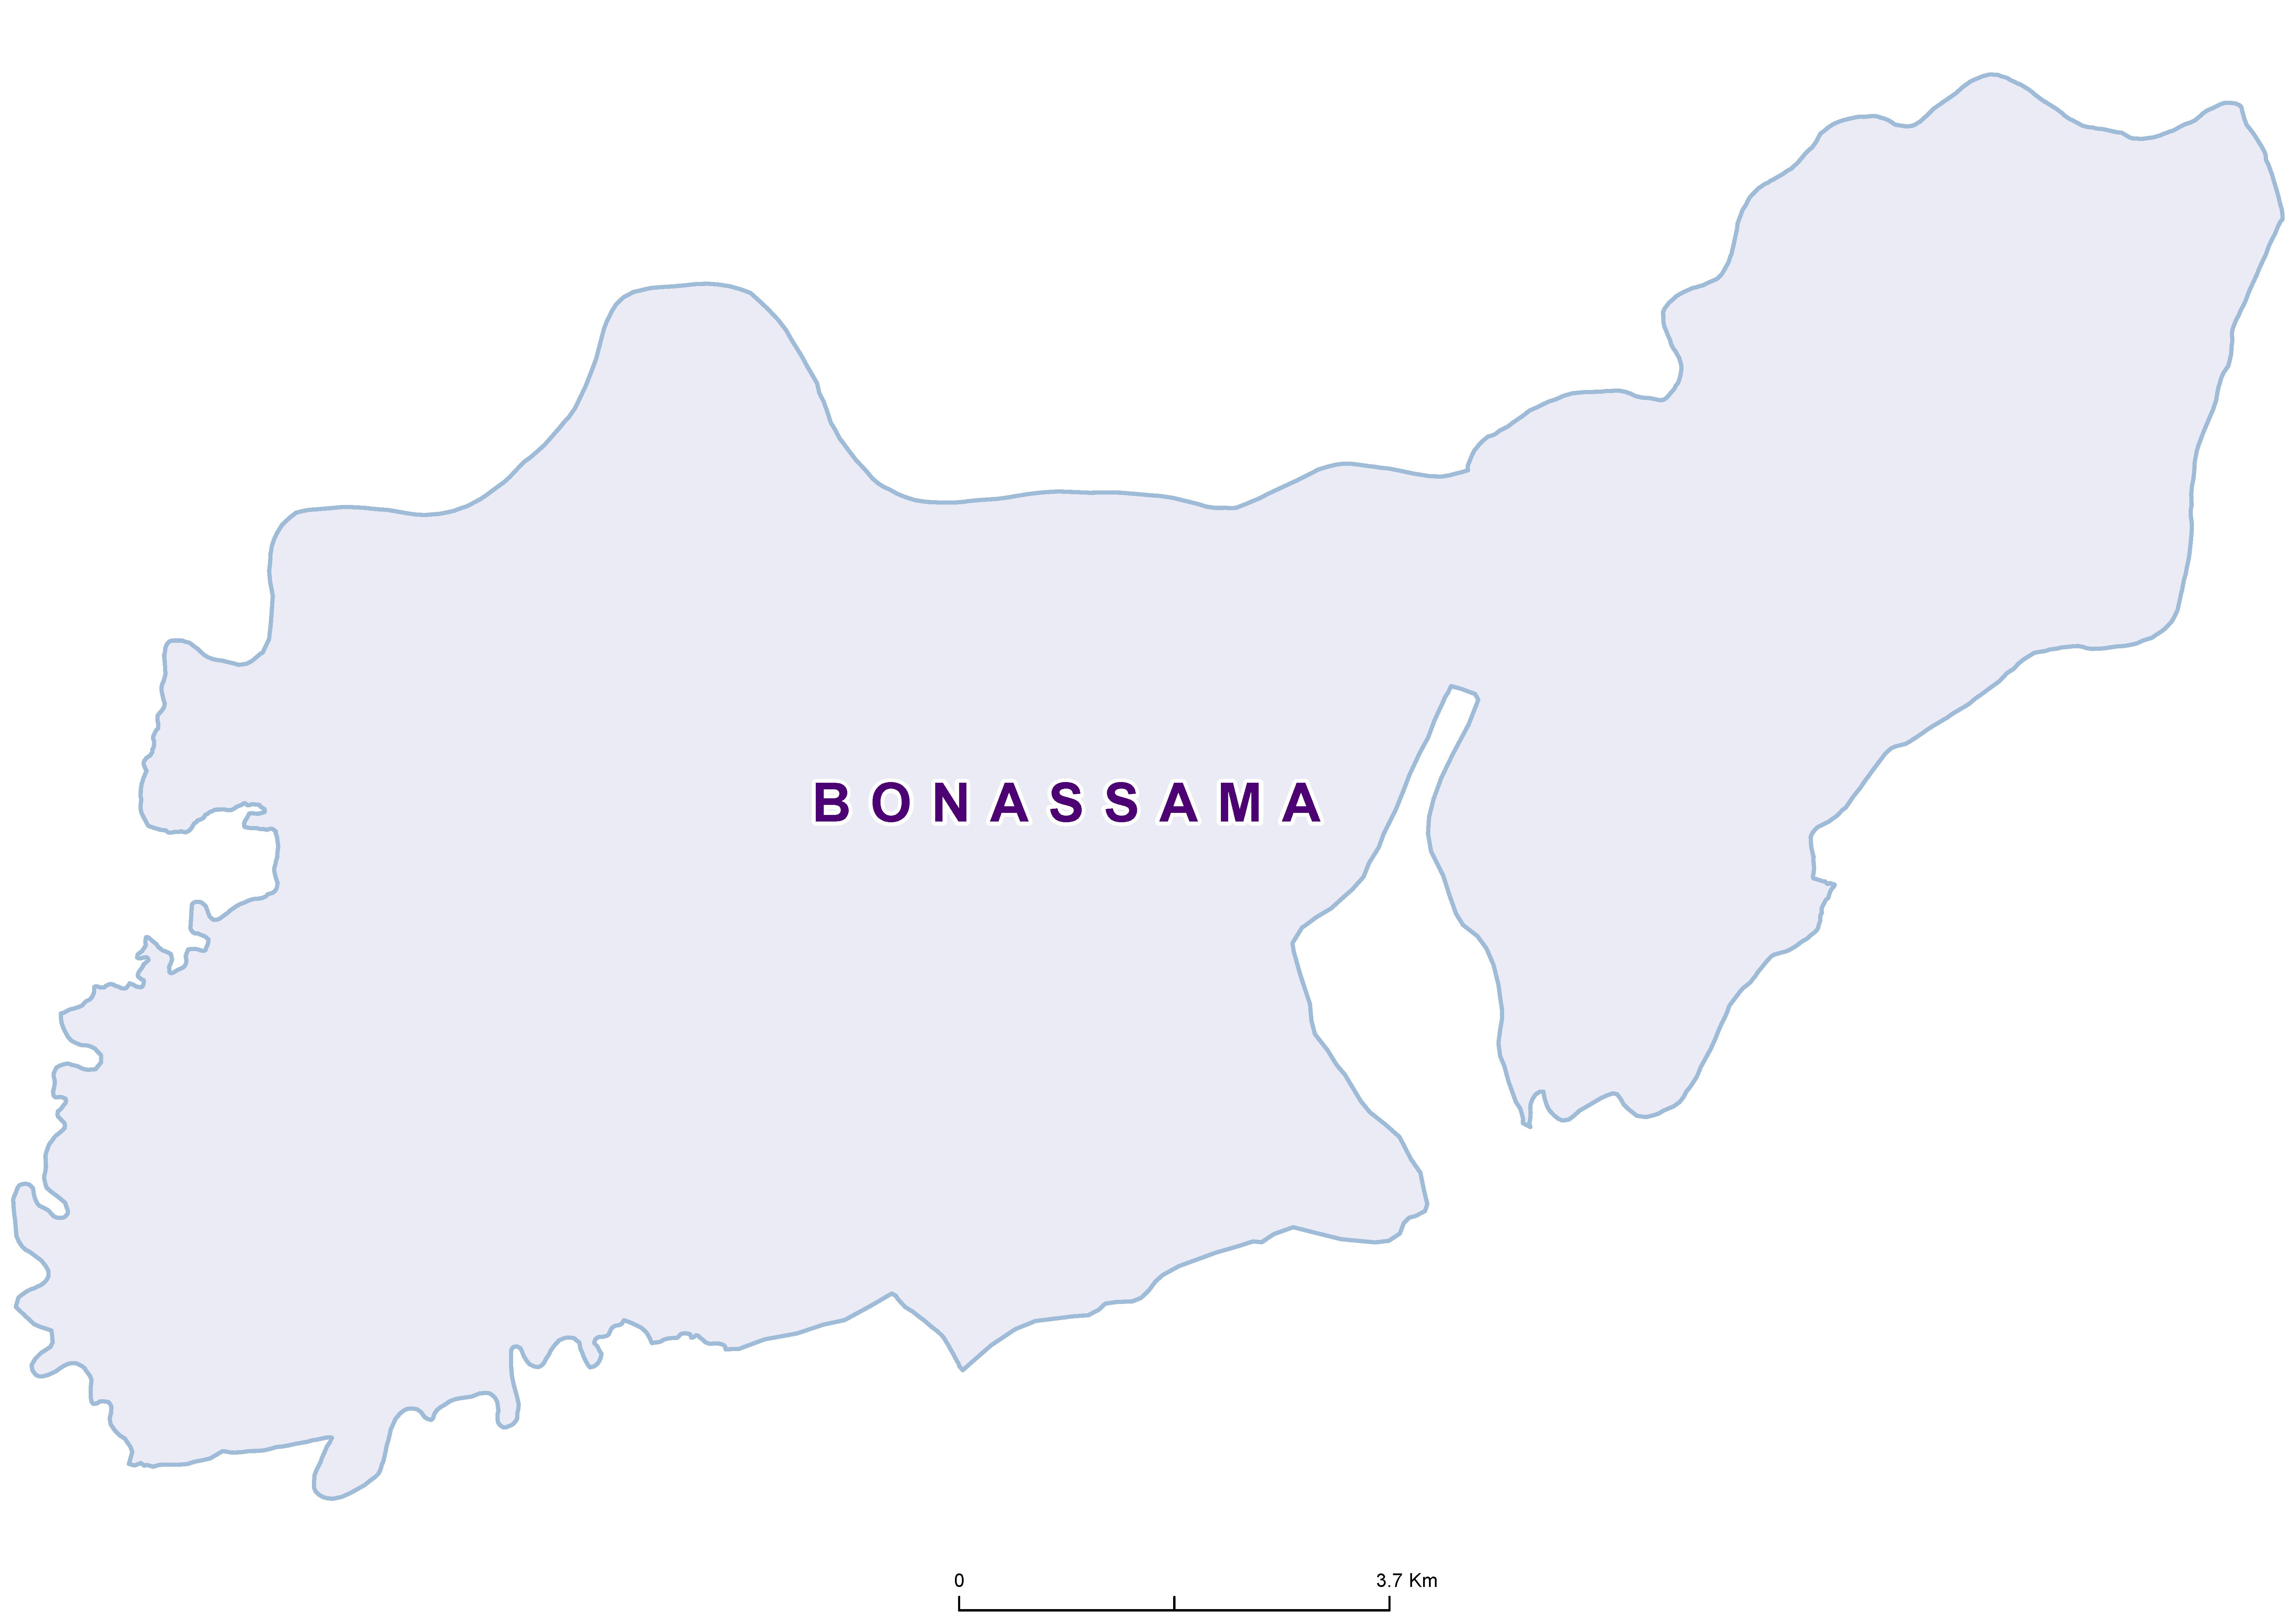 Bonassama Mean SCH 19850001